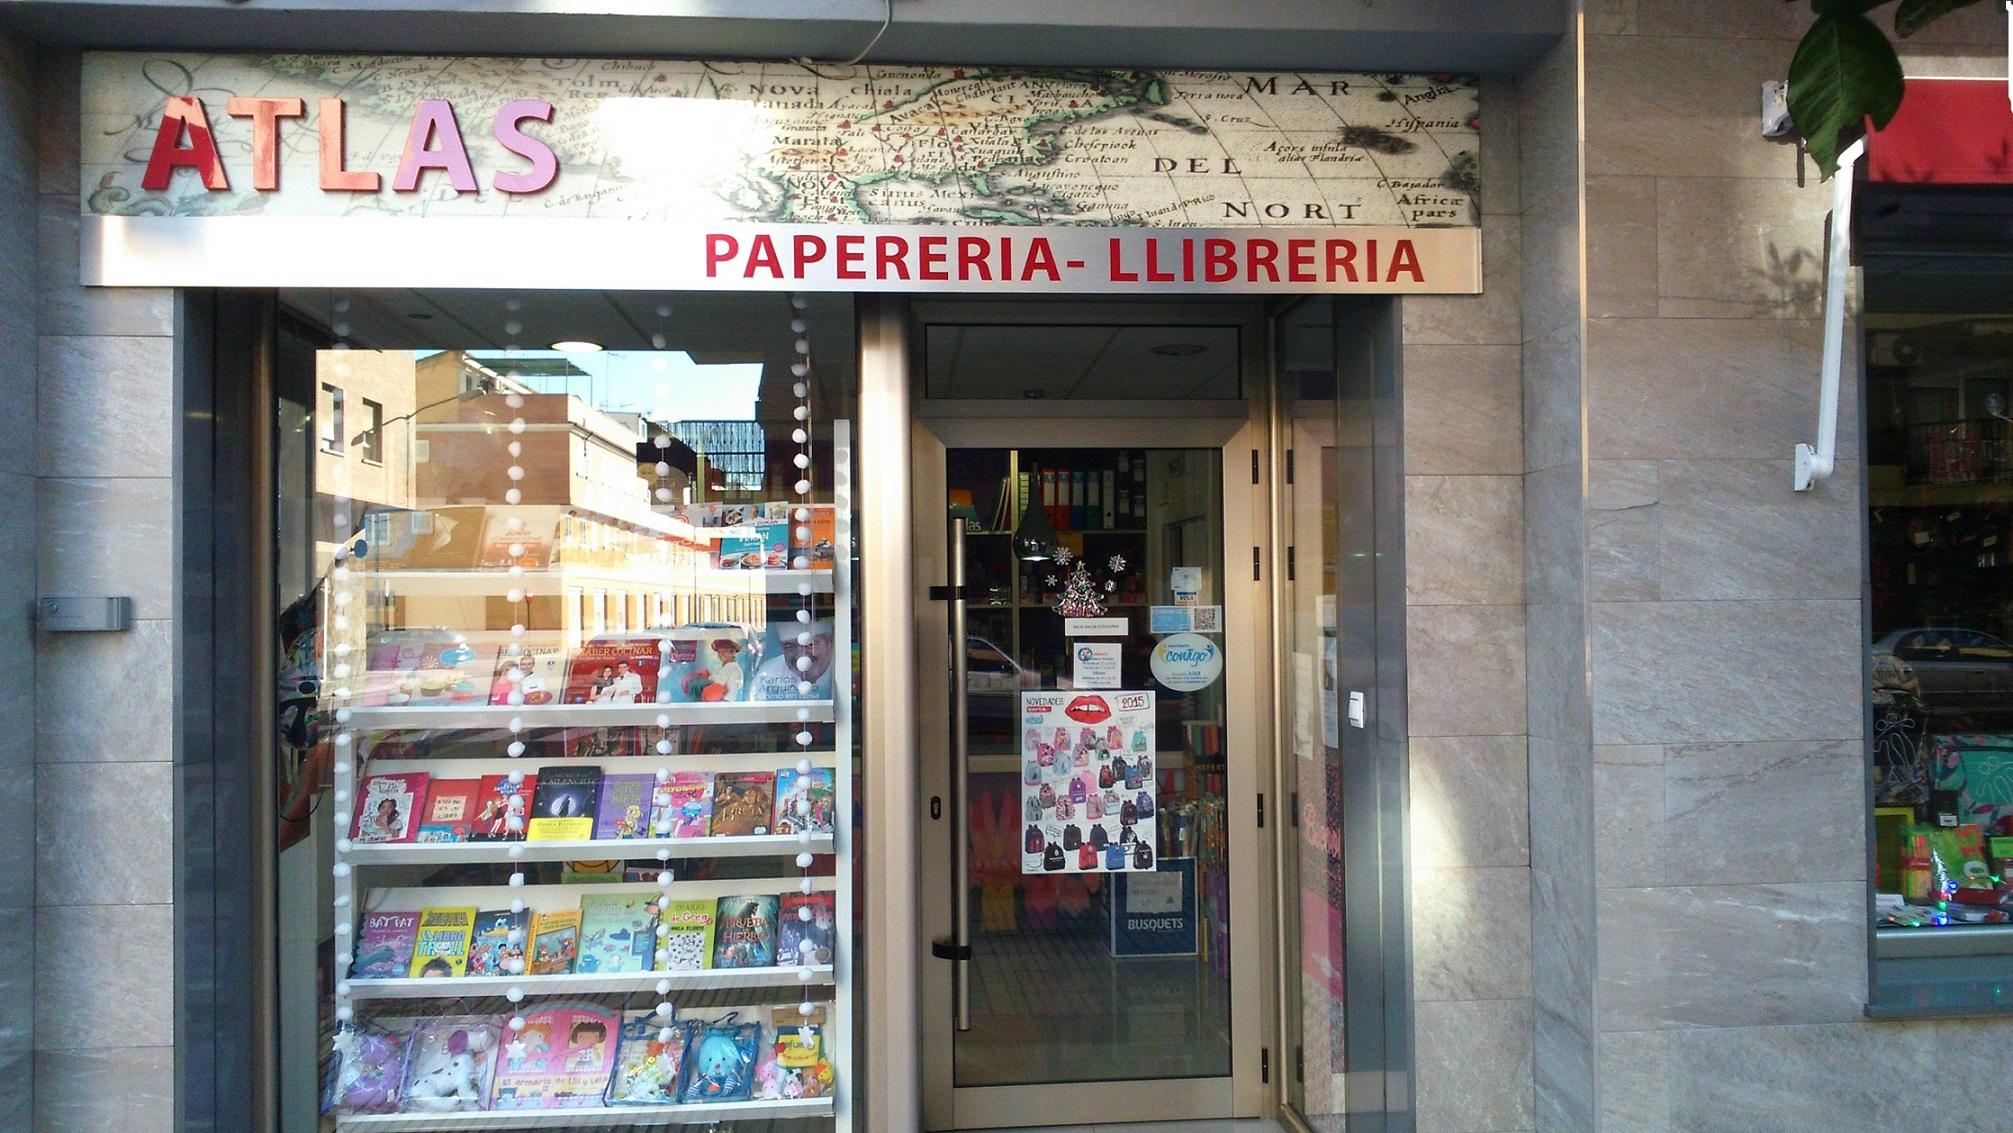 ATLAS PAPERERIA-LLIBRERIA